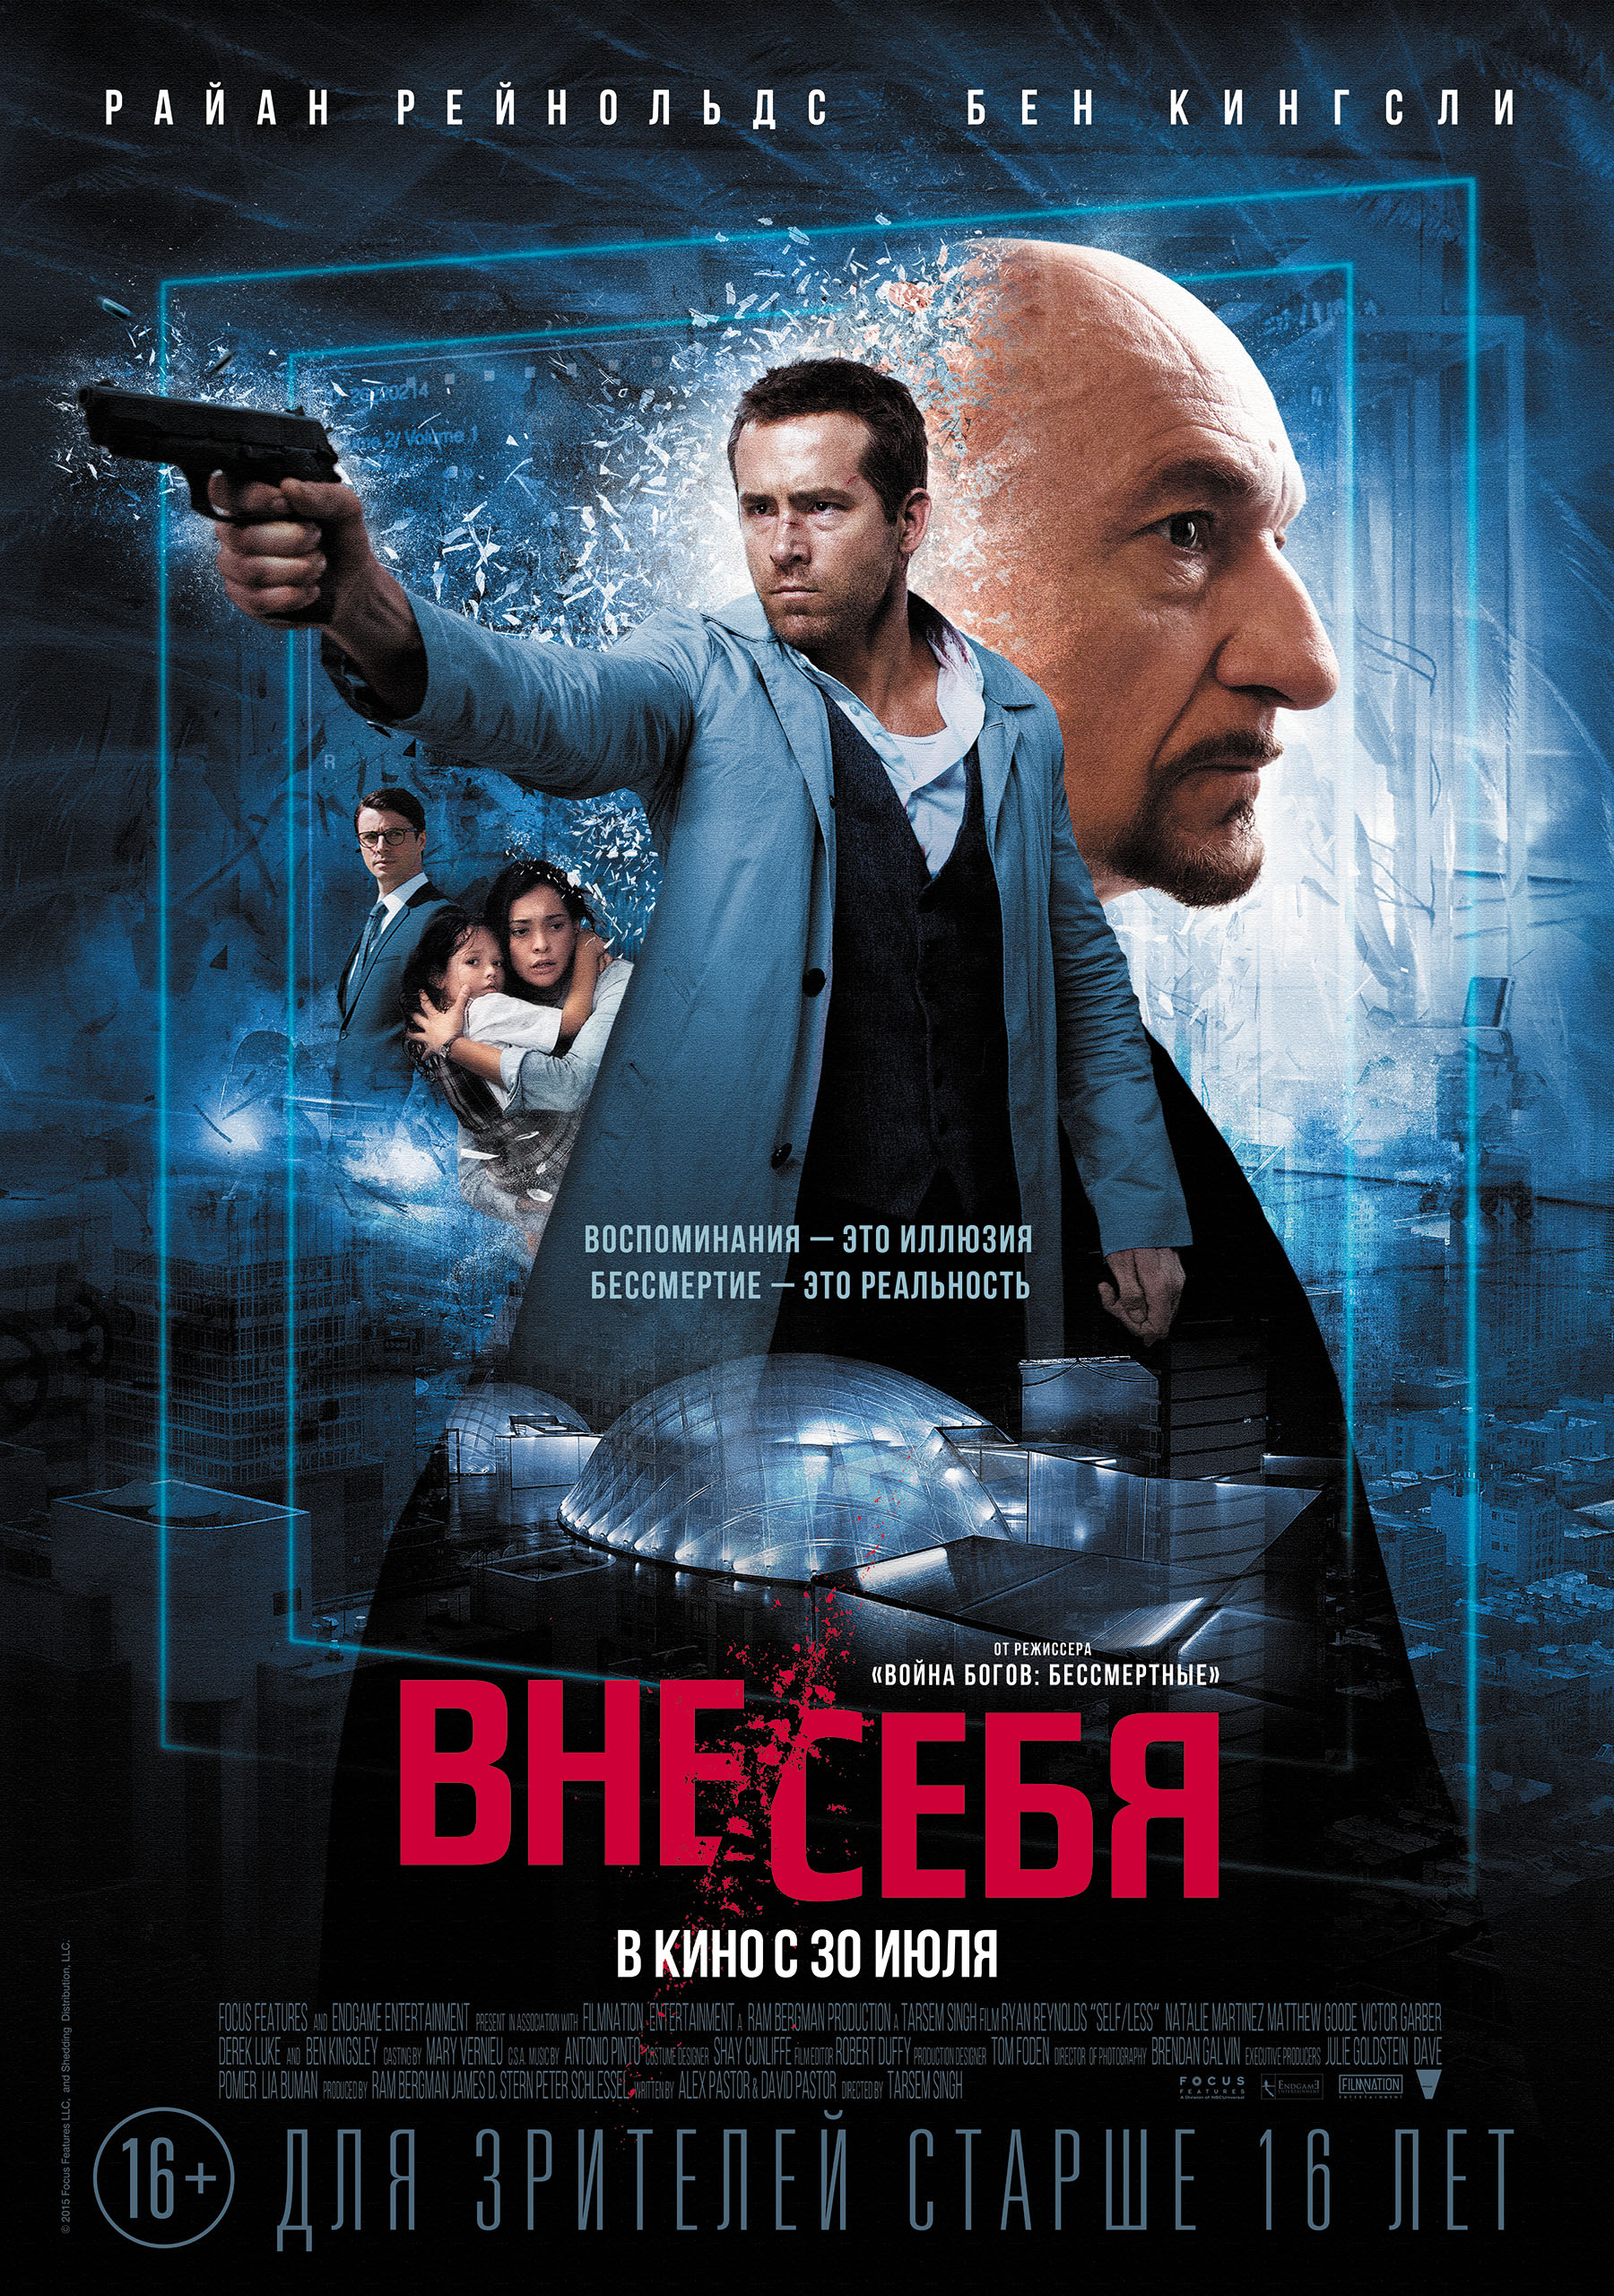 Вне себя (2015). Hd(фантастика, триллер, боевик).